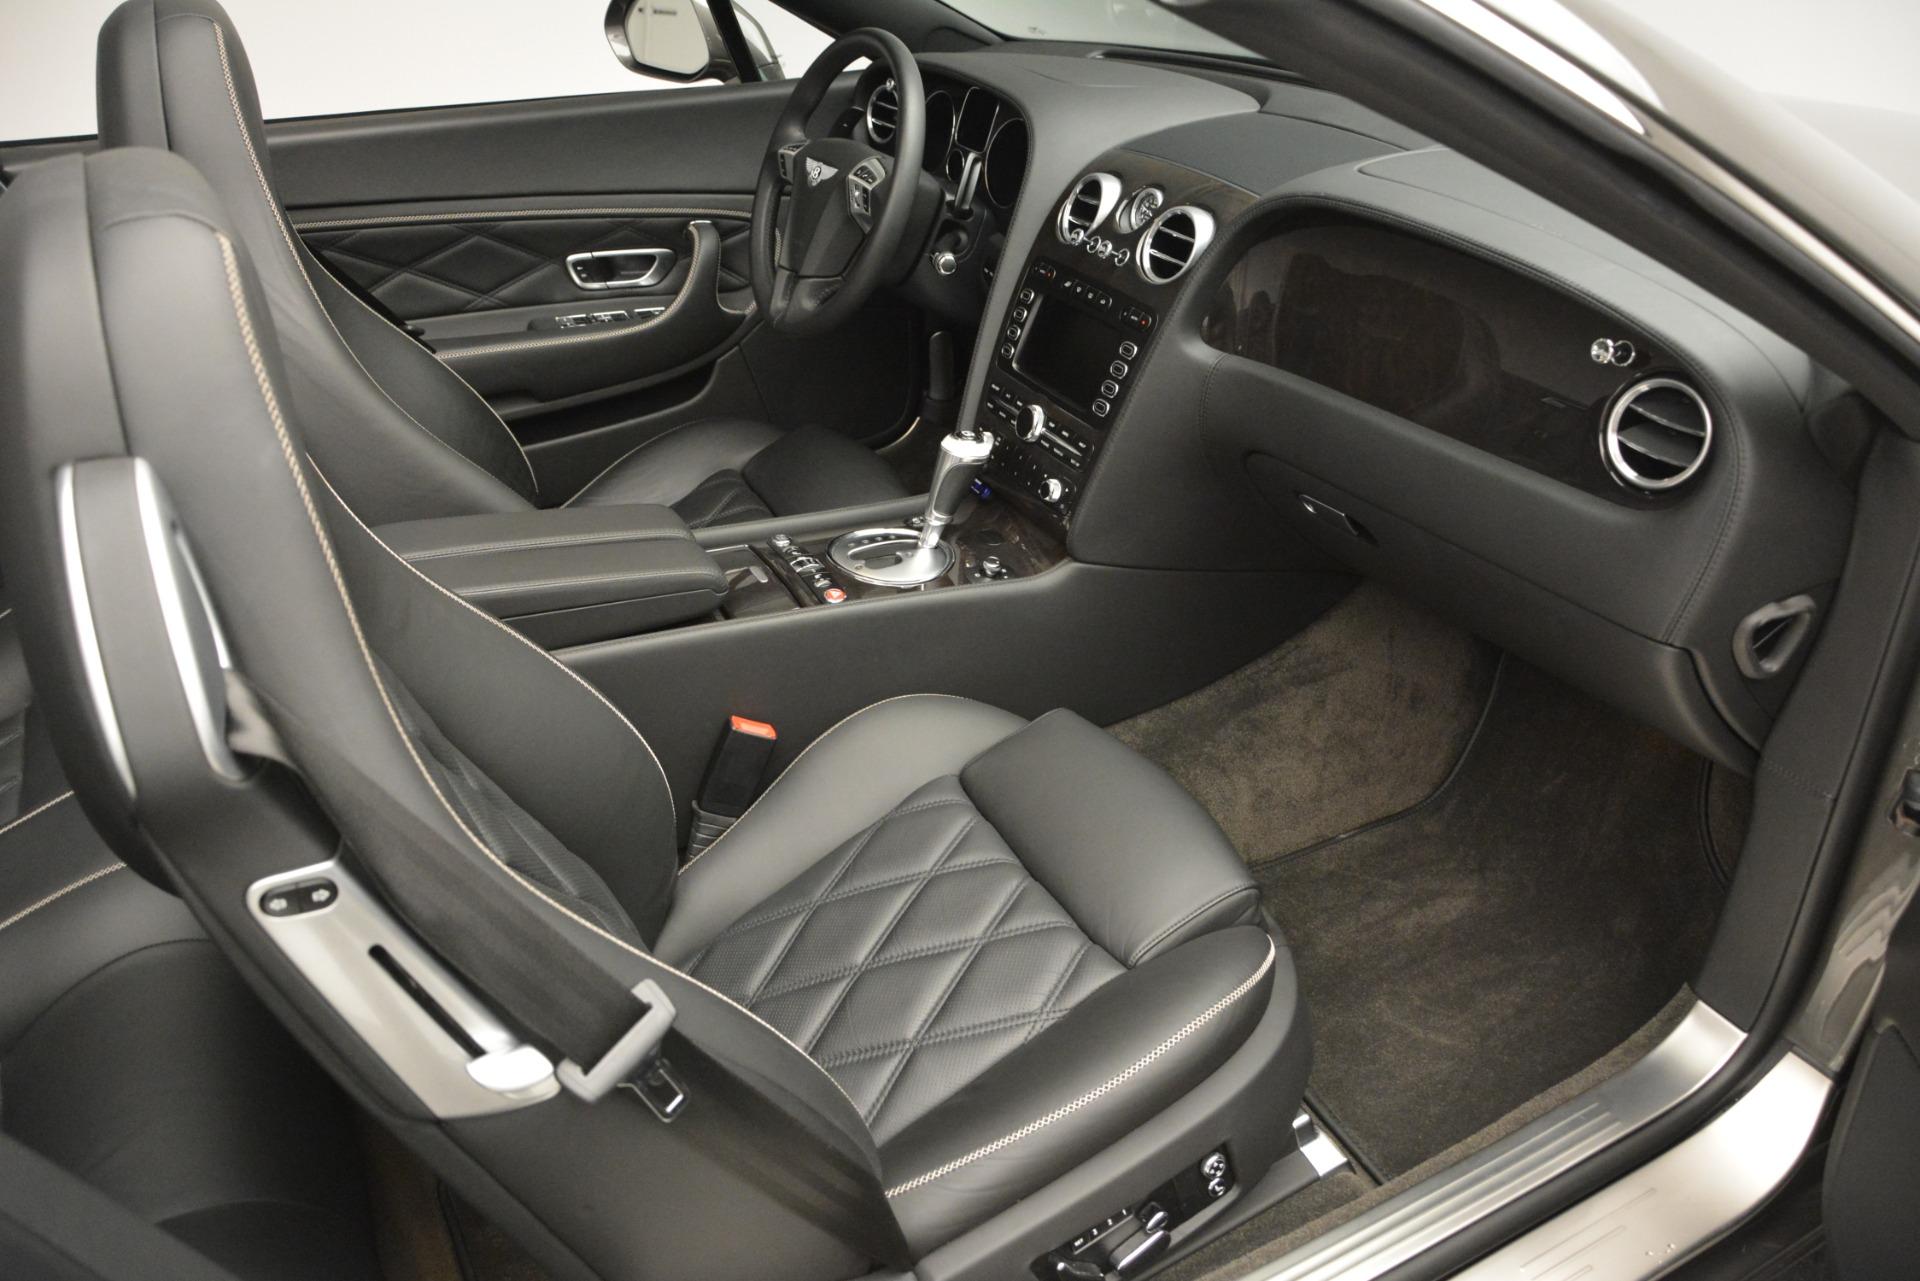 Used 2010 Bentley Continental GT Speed For Sale In Westport, CT 2677_p30